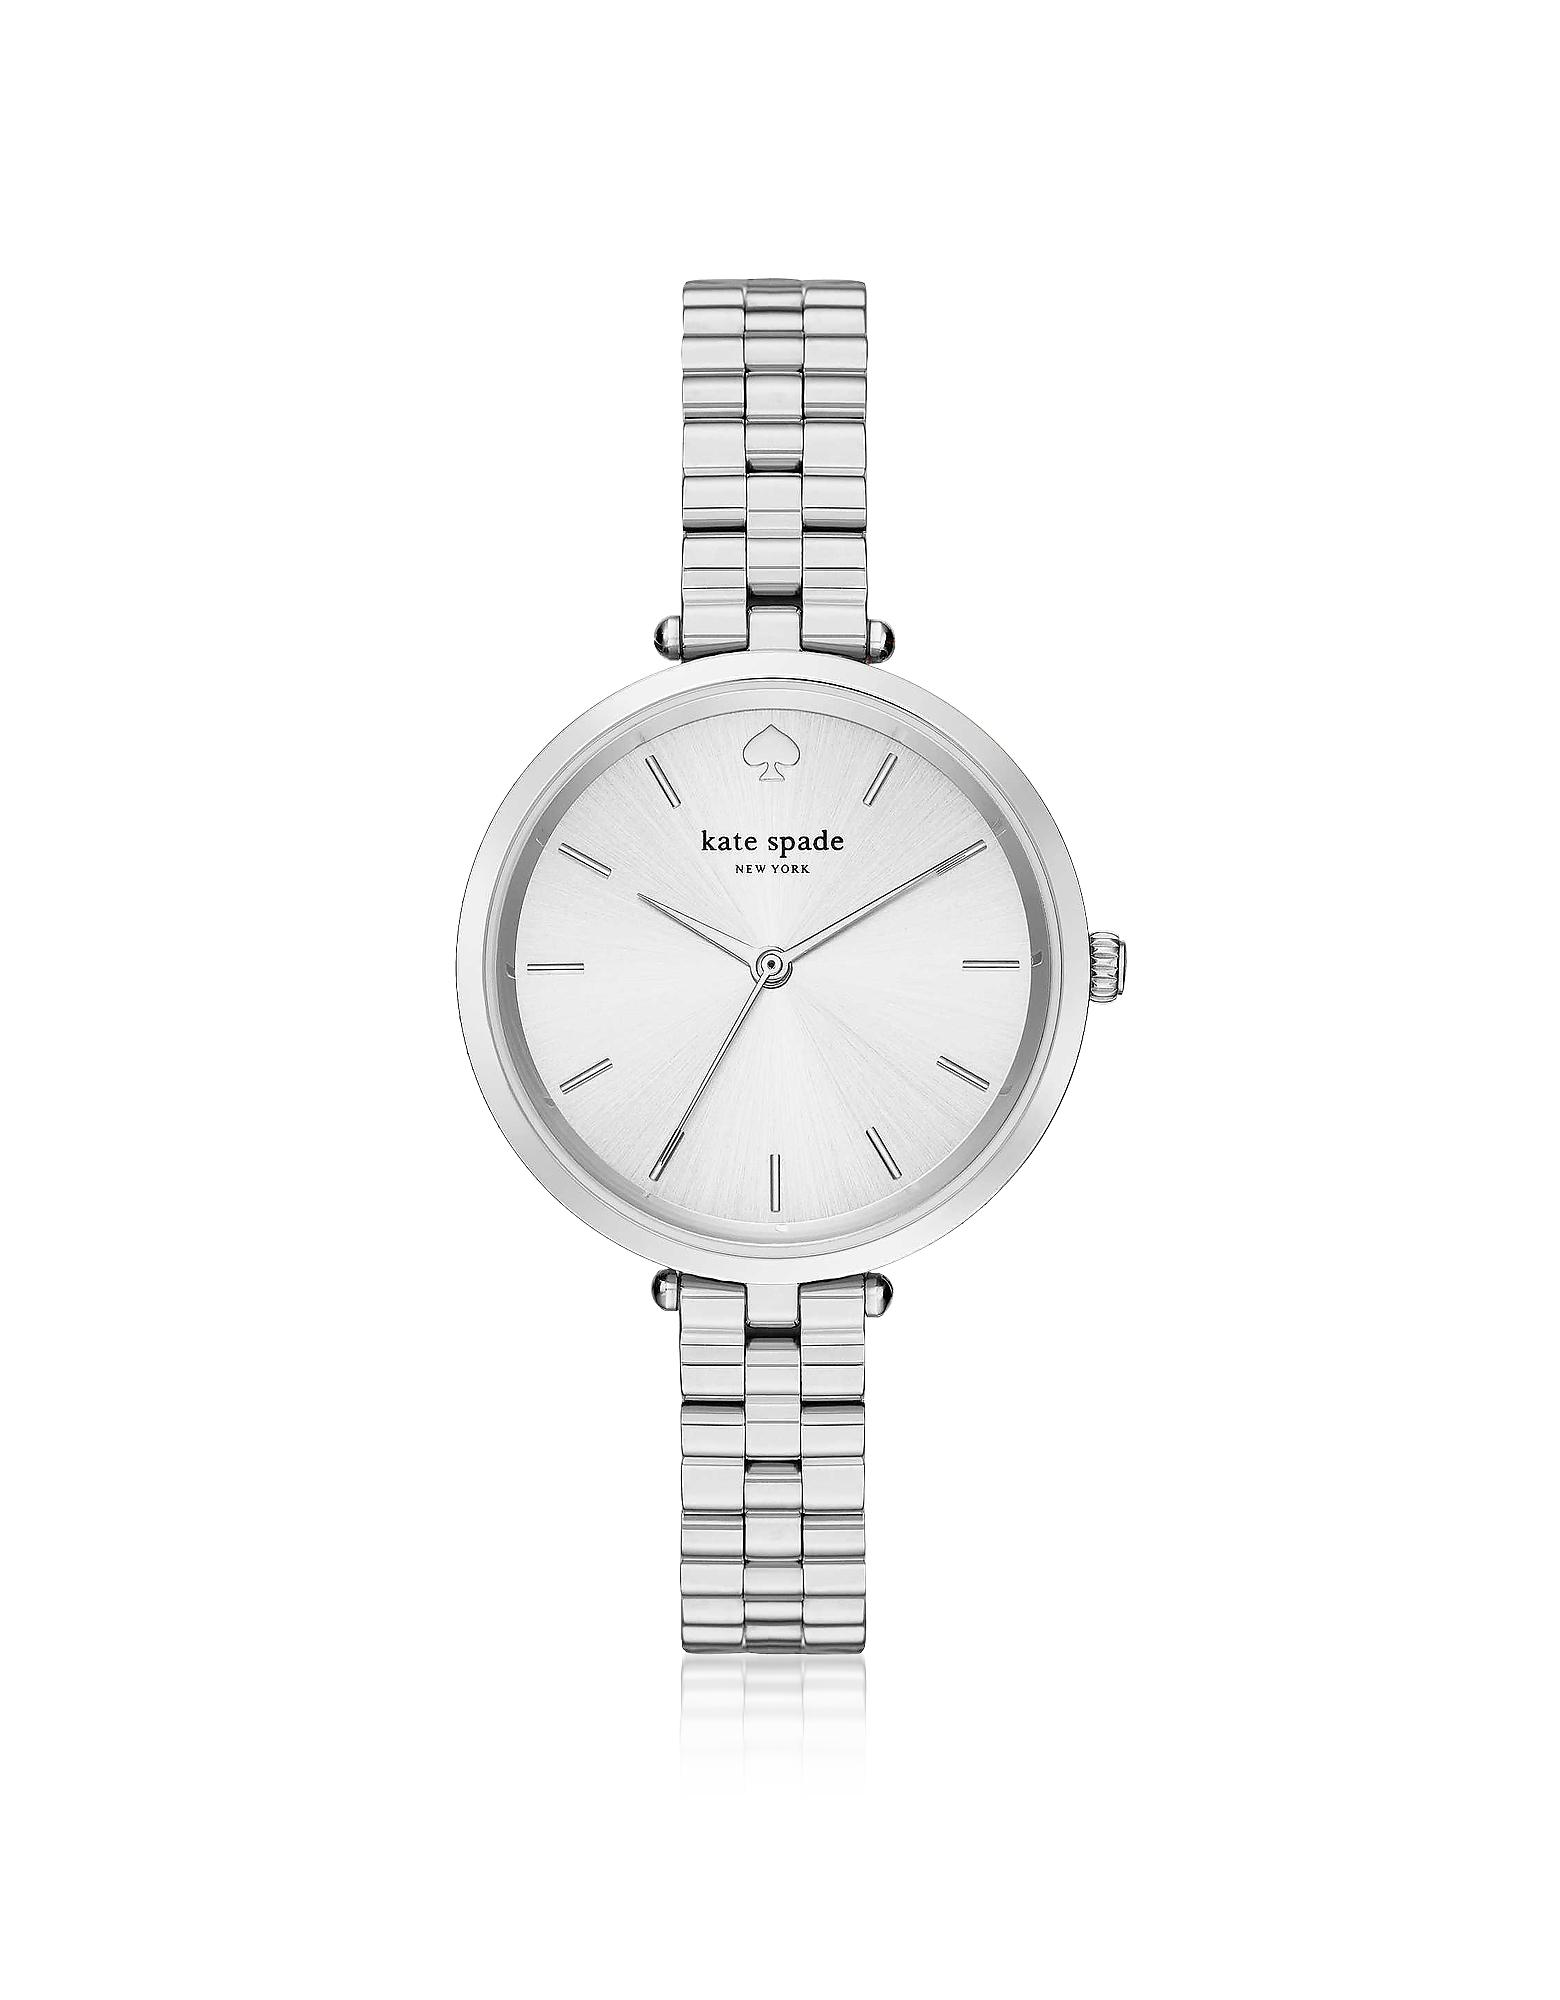 Kate Spade New York Women's Watches, Holland Skinny Silver Tone Bracelet Watch